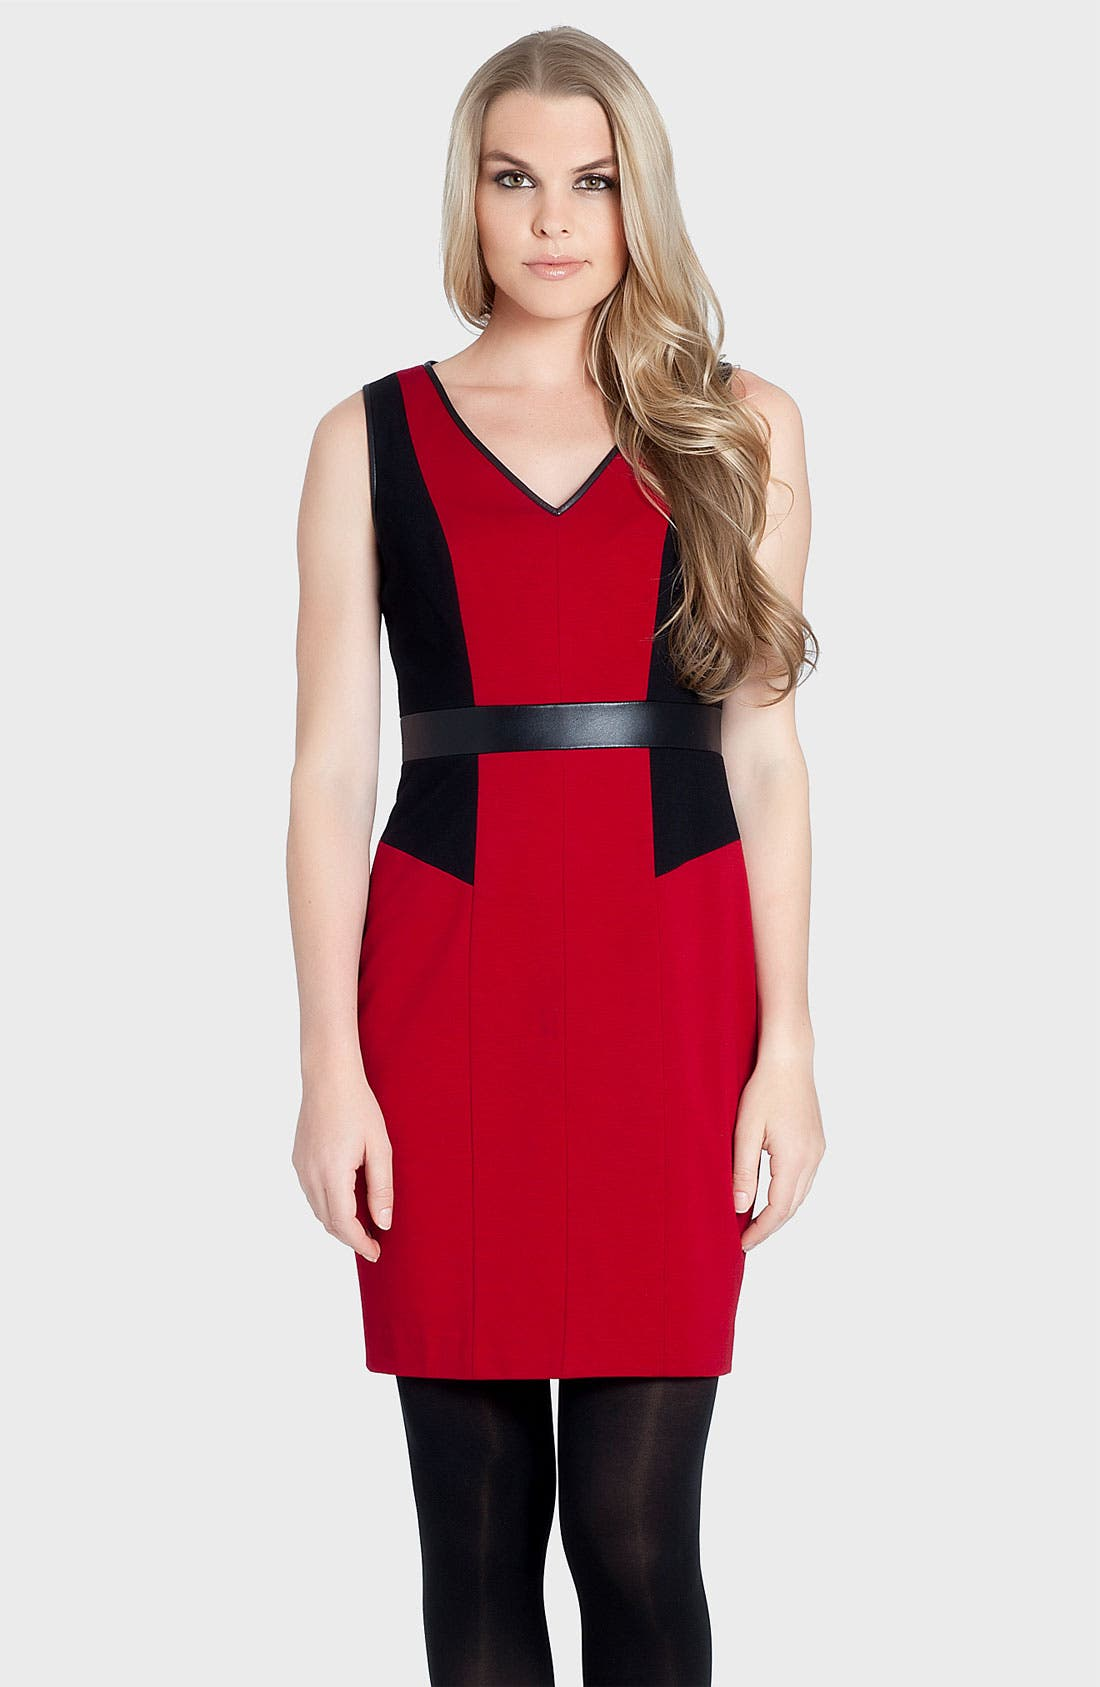 Alternate Image 1 Selected - Cynthia Steffe 'Alana' V-Neck Colorblock Sheath Dress